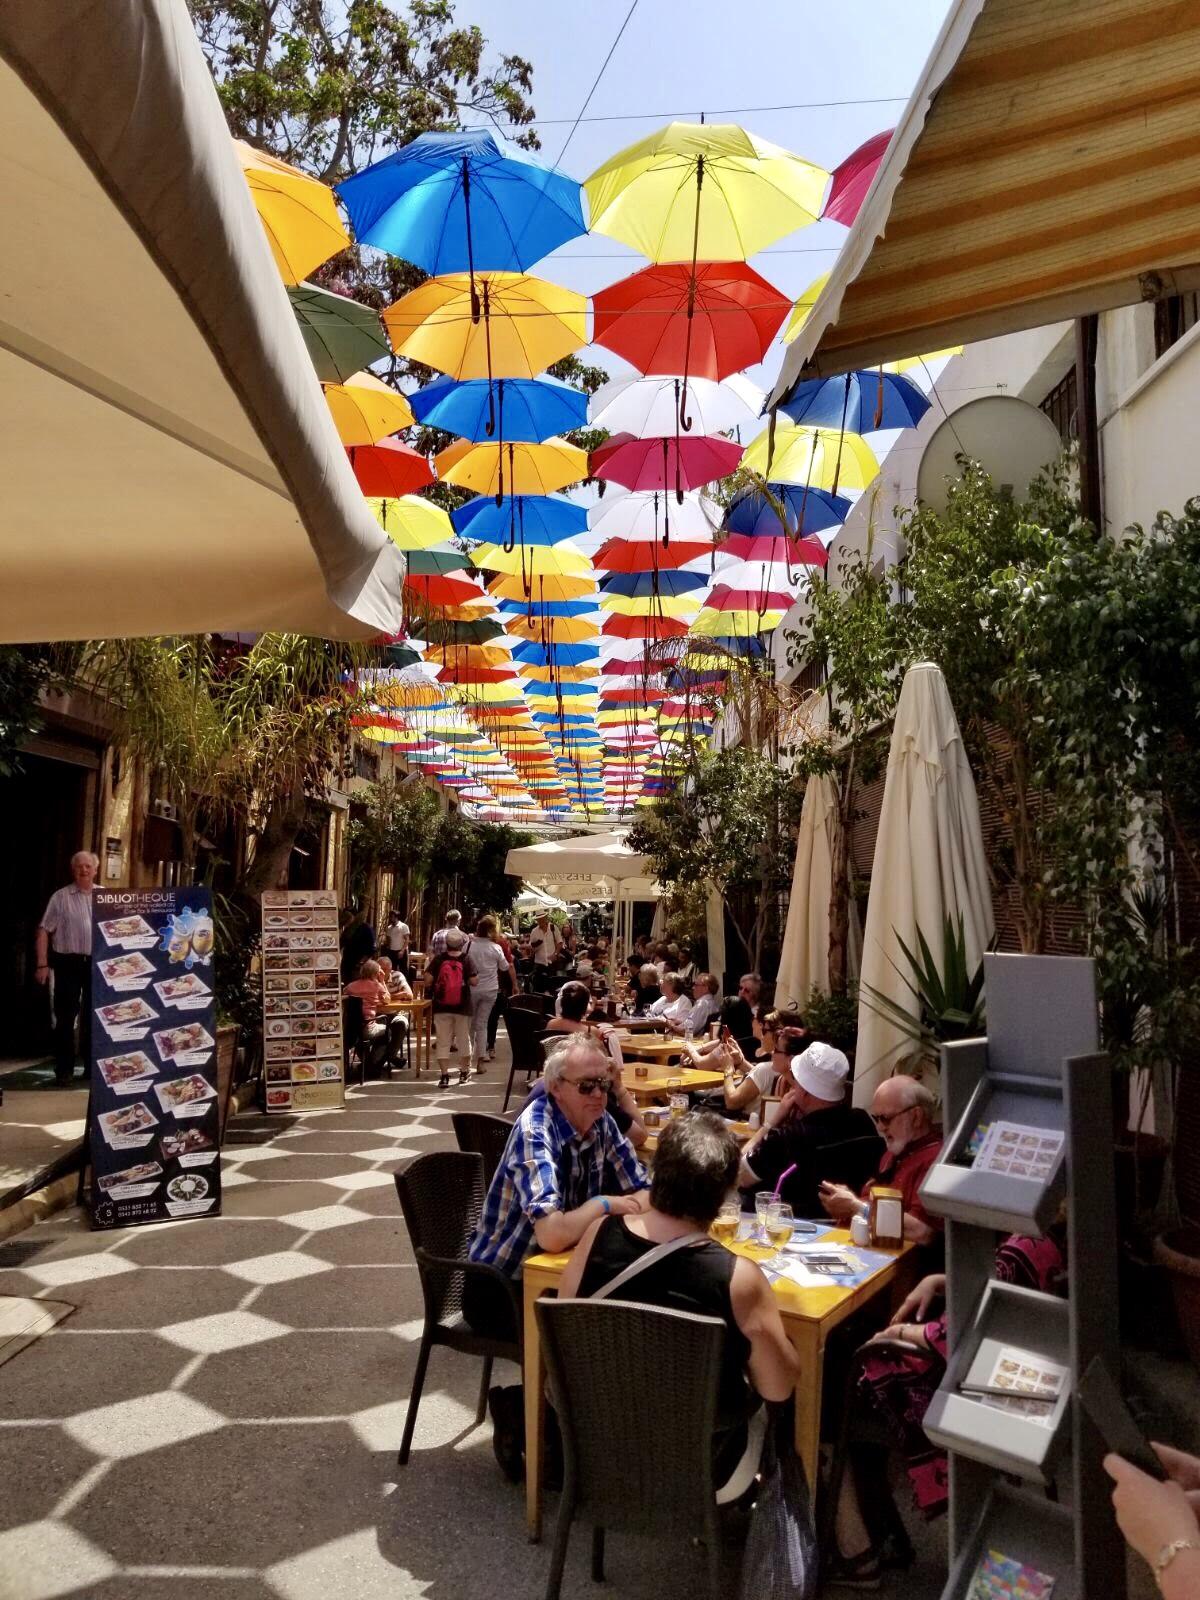 Nicosia- The Last DividedCapital